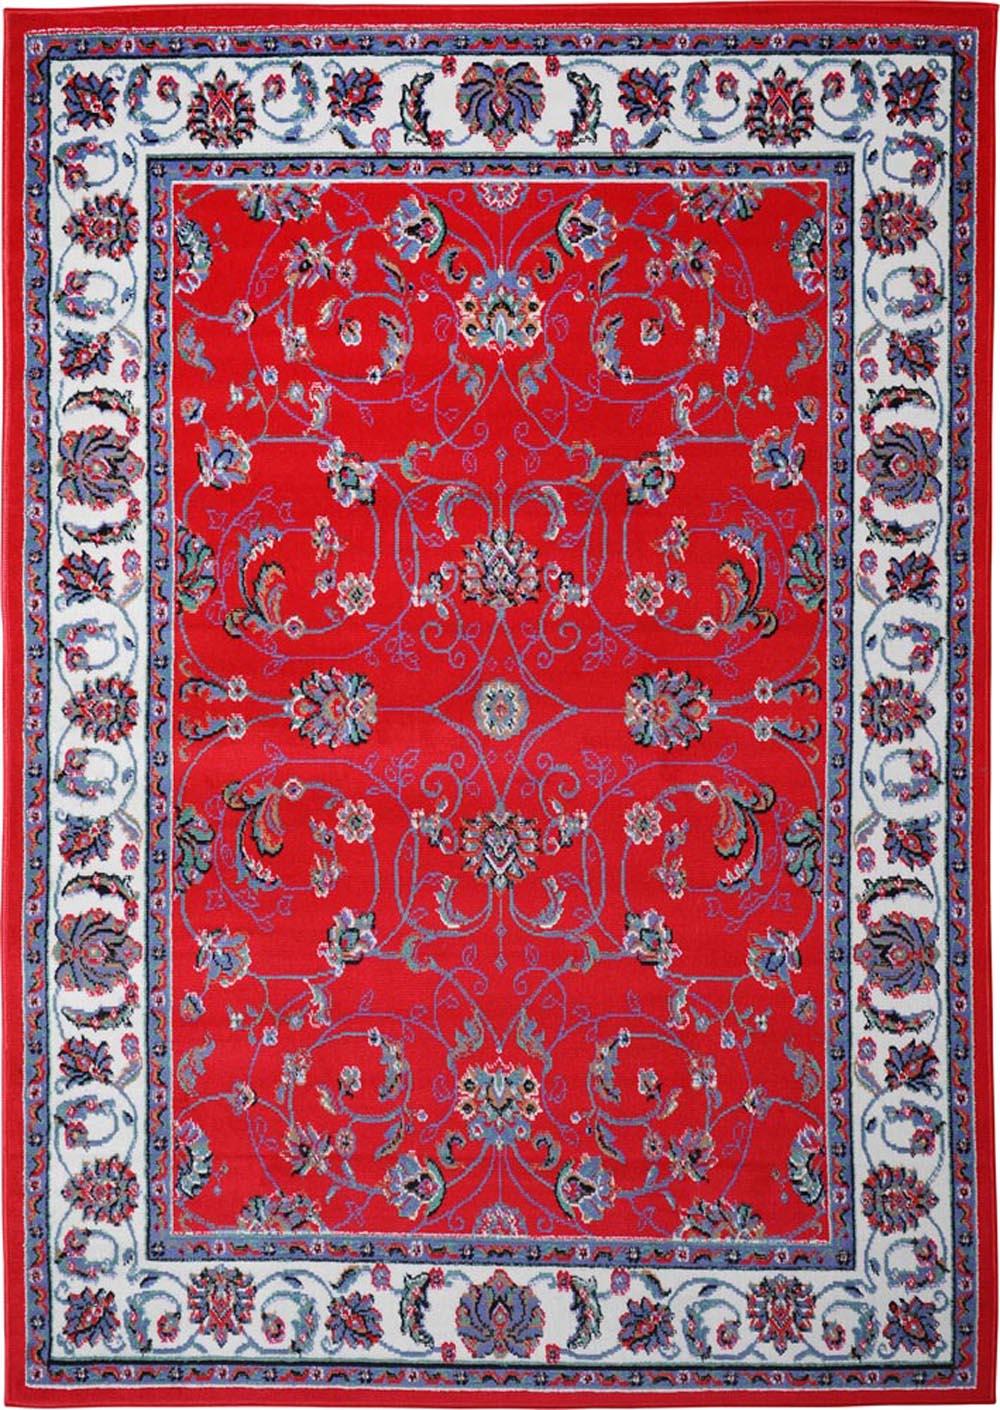 Traditional-Medallion-Persian-3-Pcs-Area-Rug-Oriental-Bordered-Runner-Mat-Set